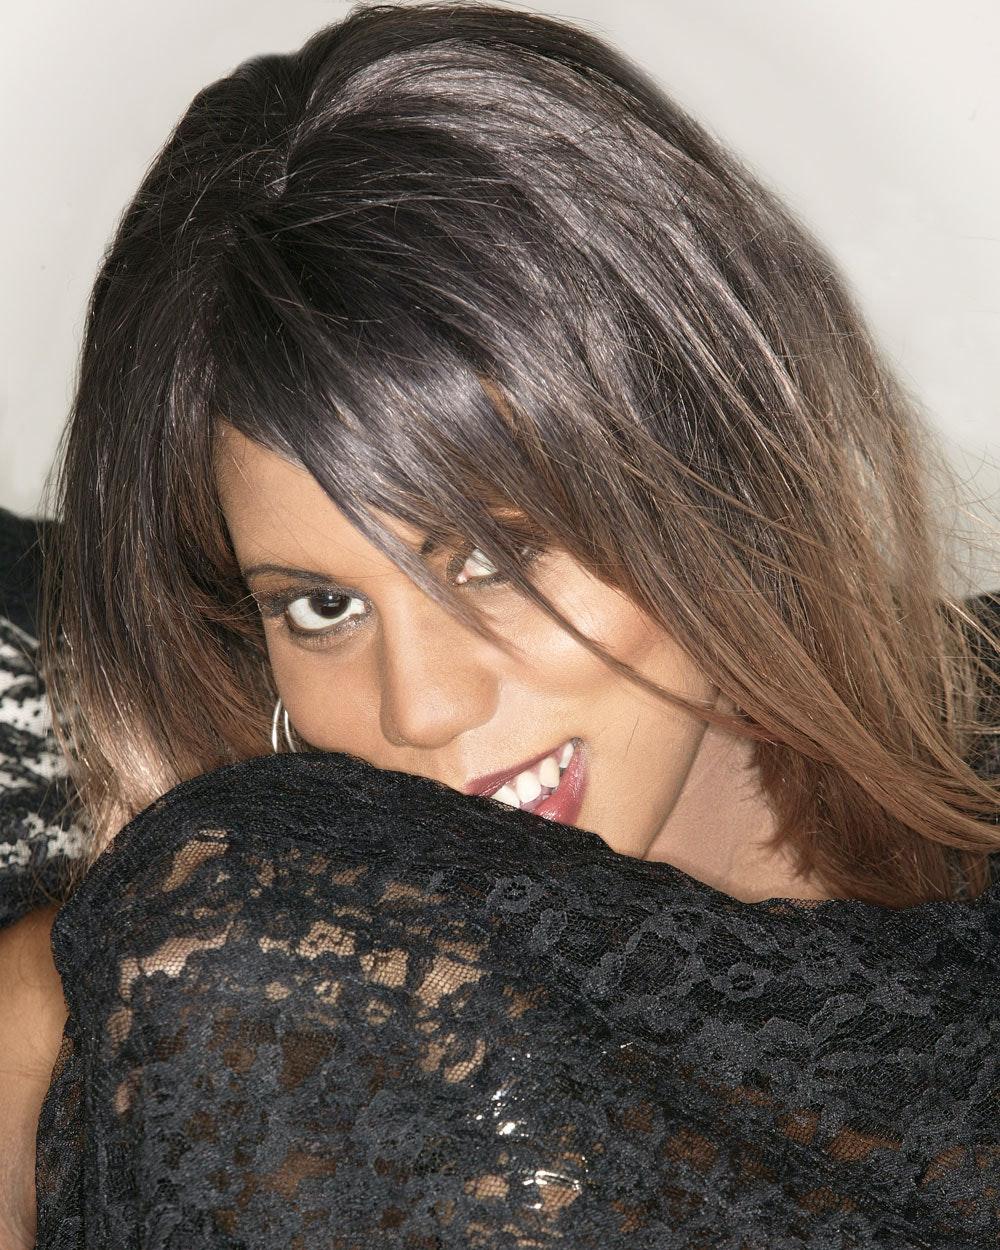 Jordana LeSesne. Photo courtesy the artist.